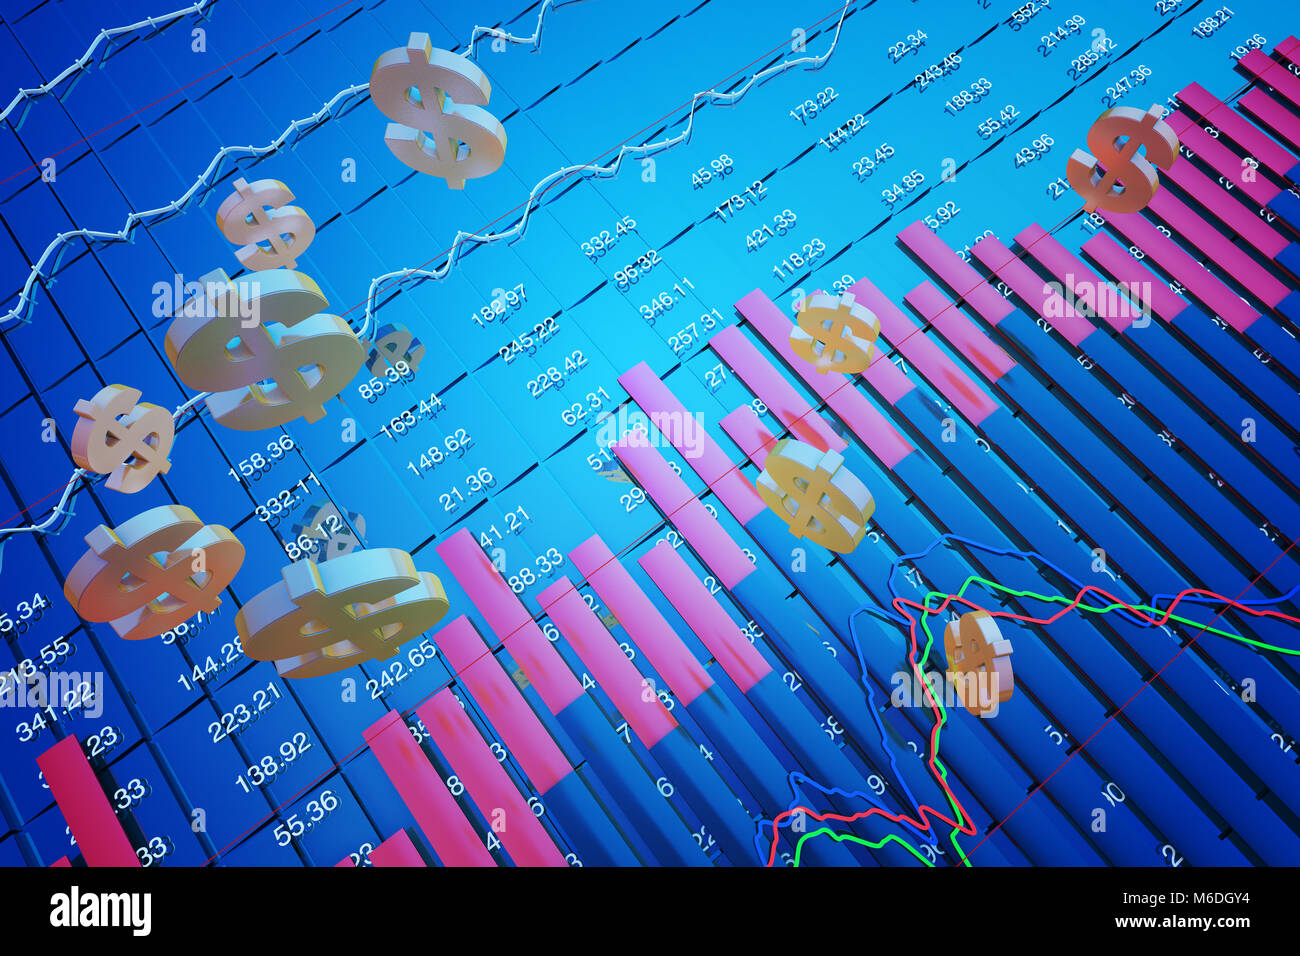 Stock market symbols stock photos stock market symbols stock financial stock market data currency symbols financial reform stock image buycottarizona Gallery